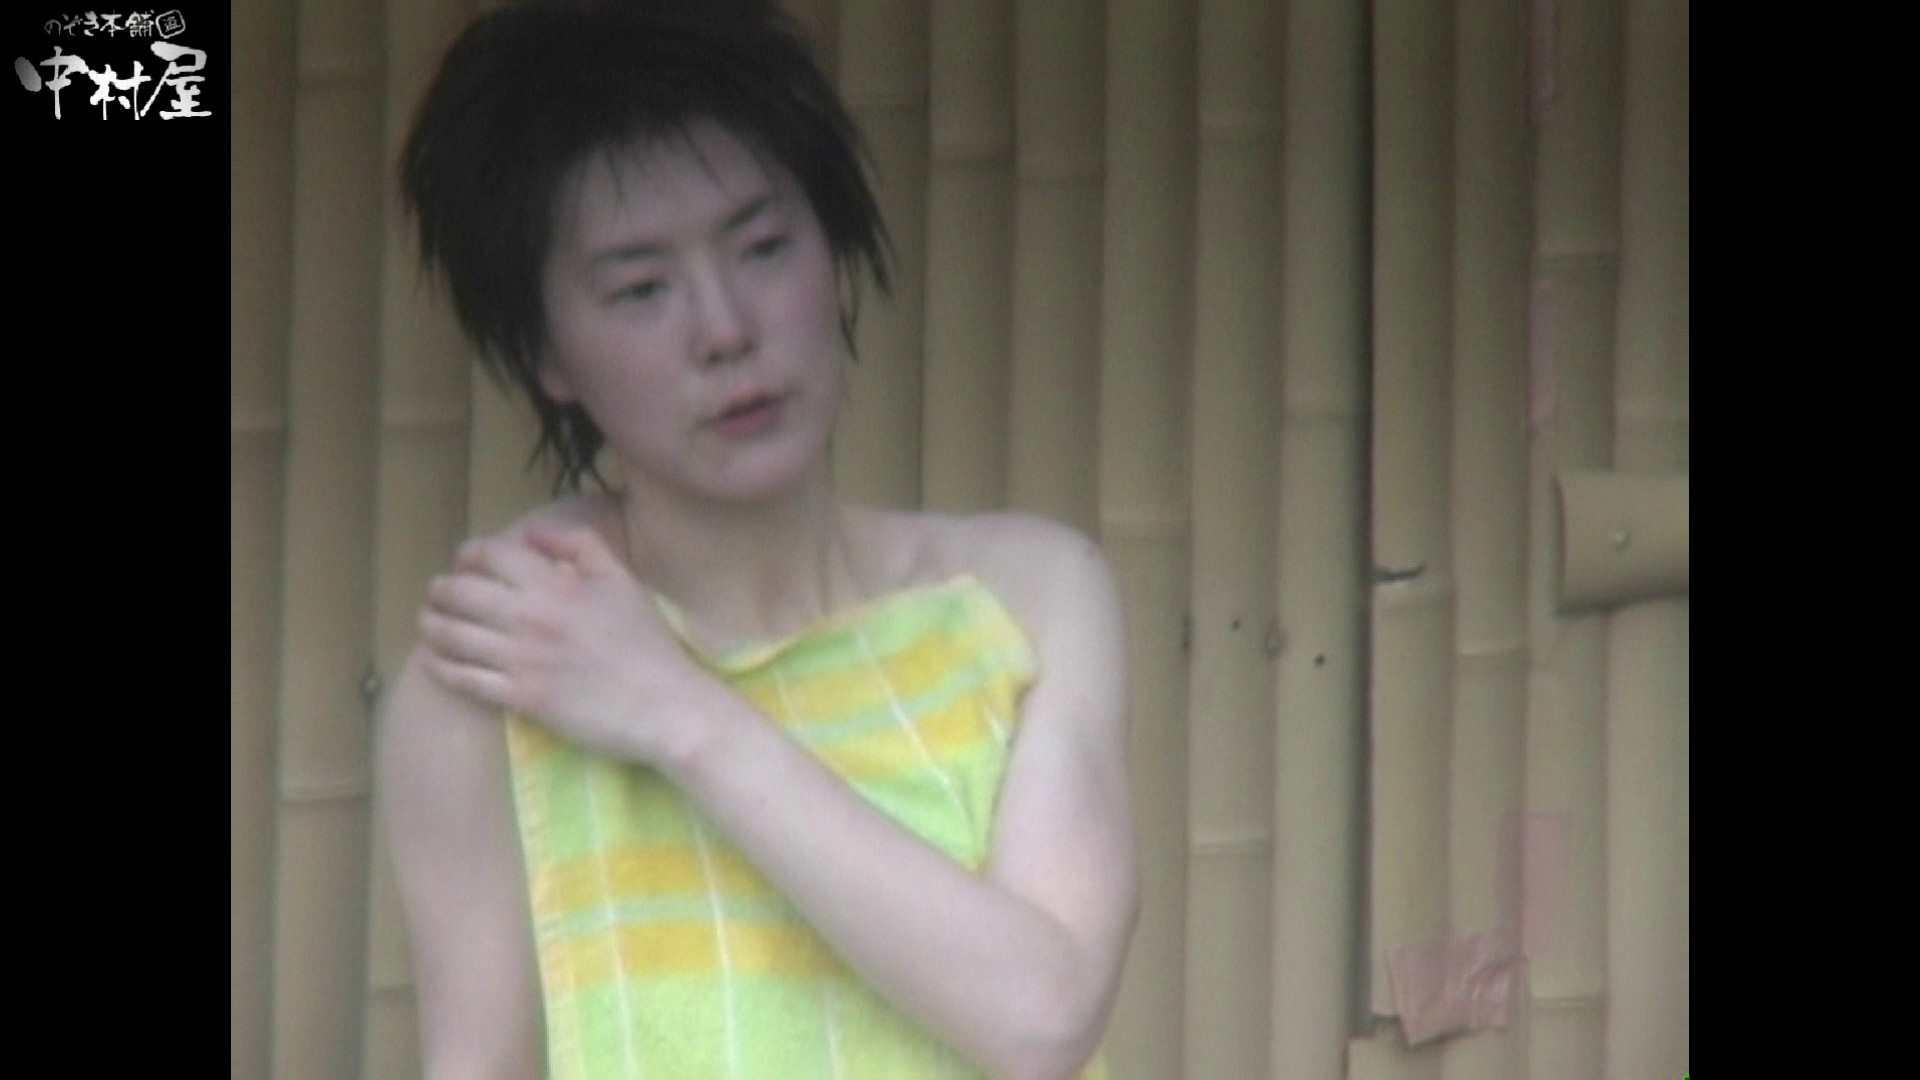 Aquaな露天風呂Vol.938 露天 濡れ場動画紹介 111pic 103